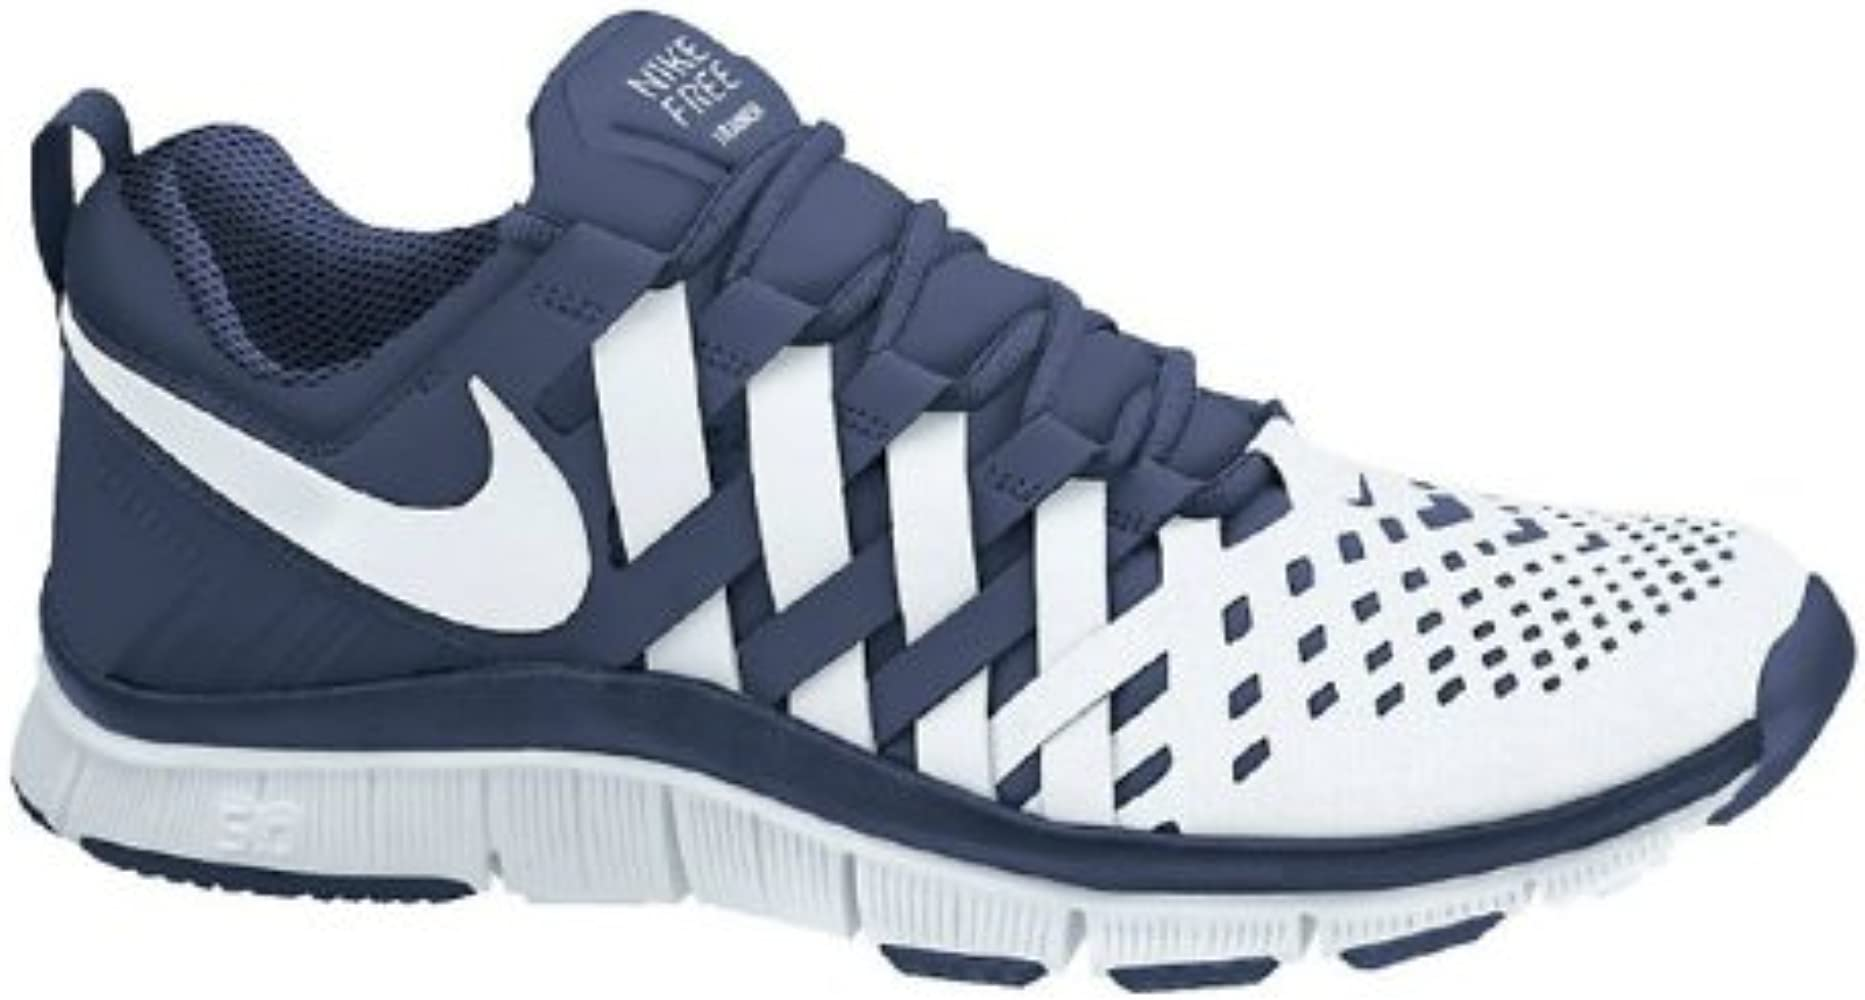 pretty nice af4e6 cbfe2 Amazon.com | Nike Free Trainer 5.0 TB Men's Training/Running ...